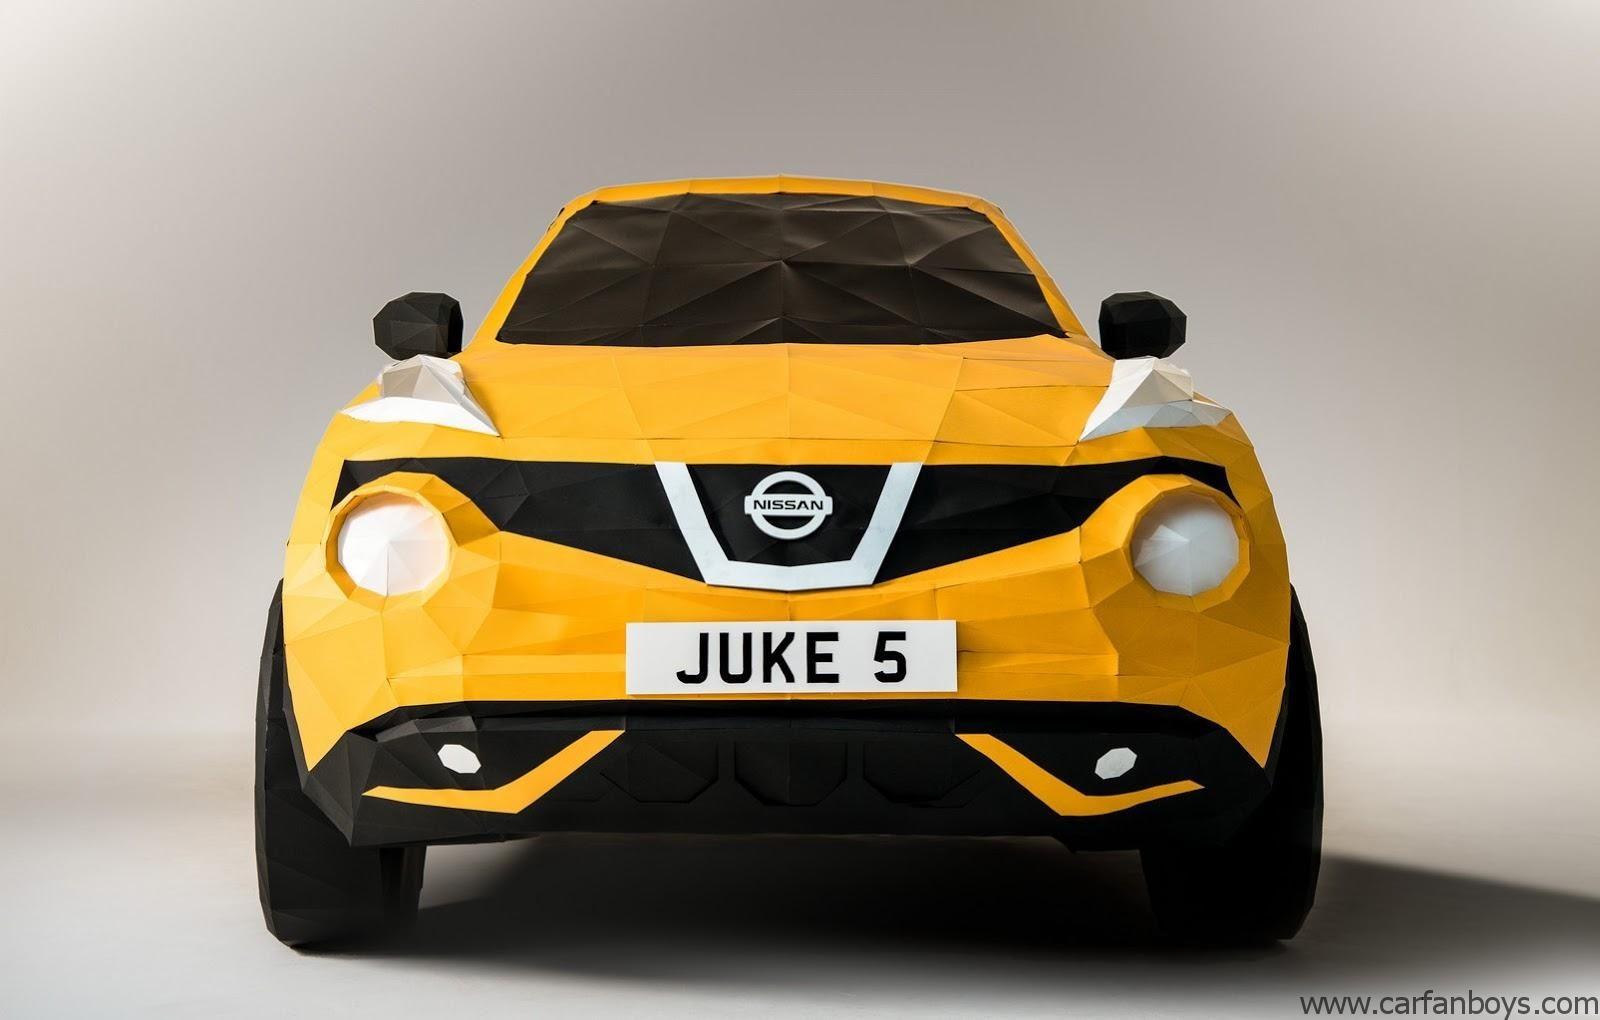 Nissan Papercraft Nissan origami Replica Juke Carfanboys